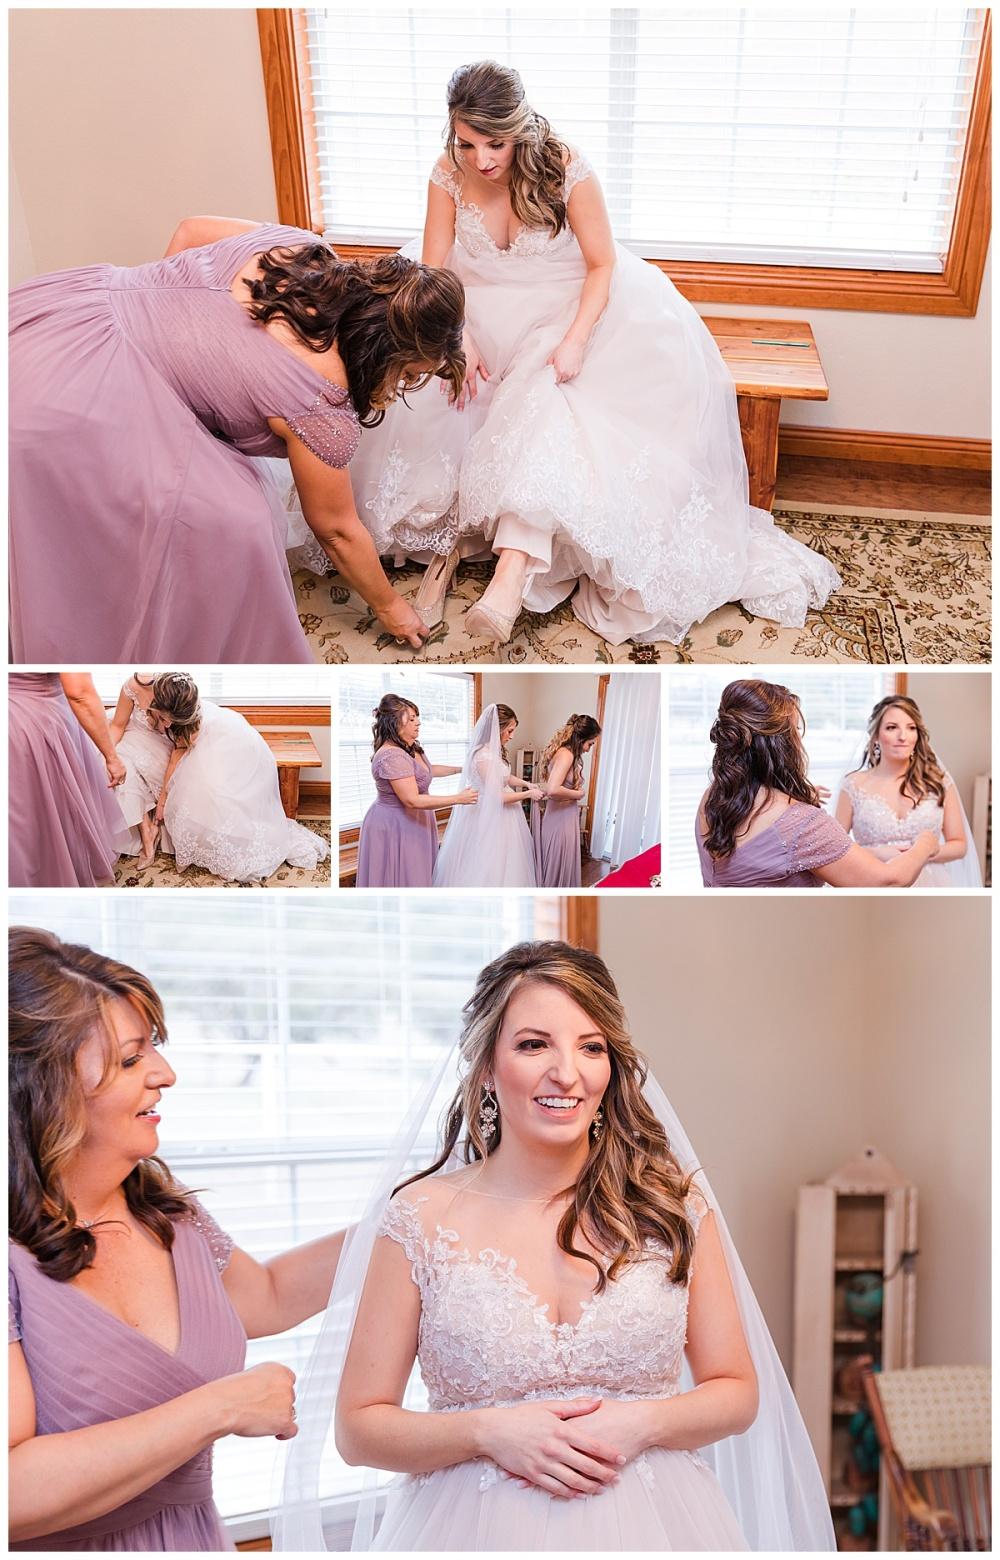 Wedding-Photographer-Texas-Hill-Country-Happy-H-Ranch-Comfor-Texas-Carly-Barton-Photography_0016.jpg